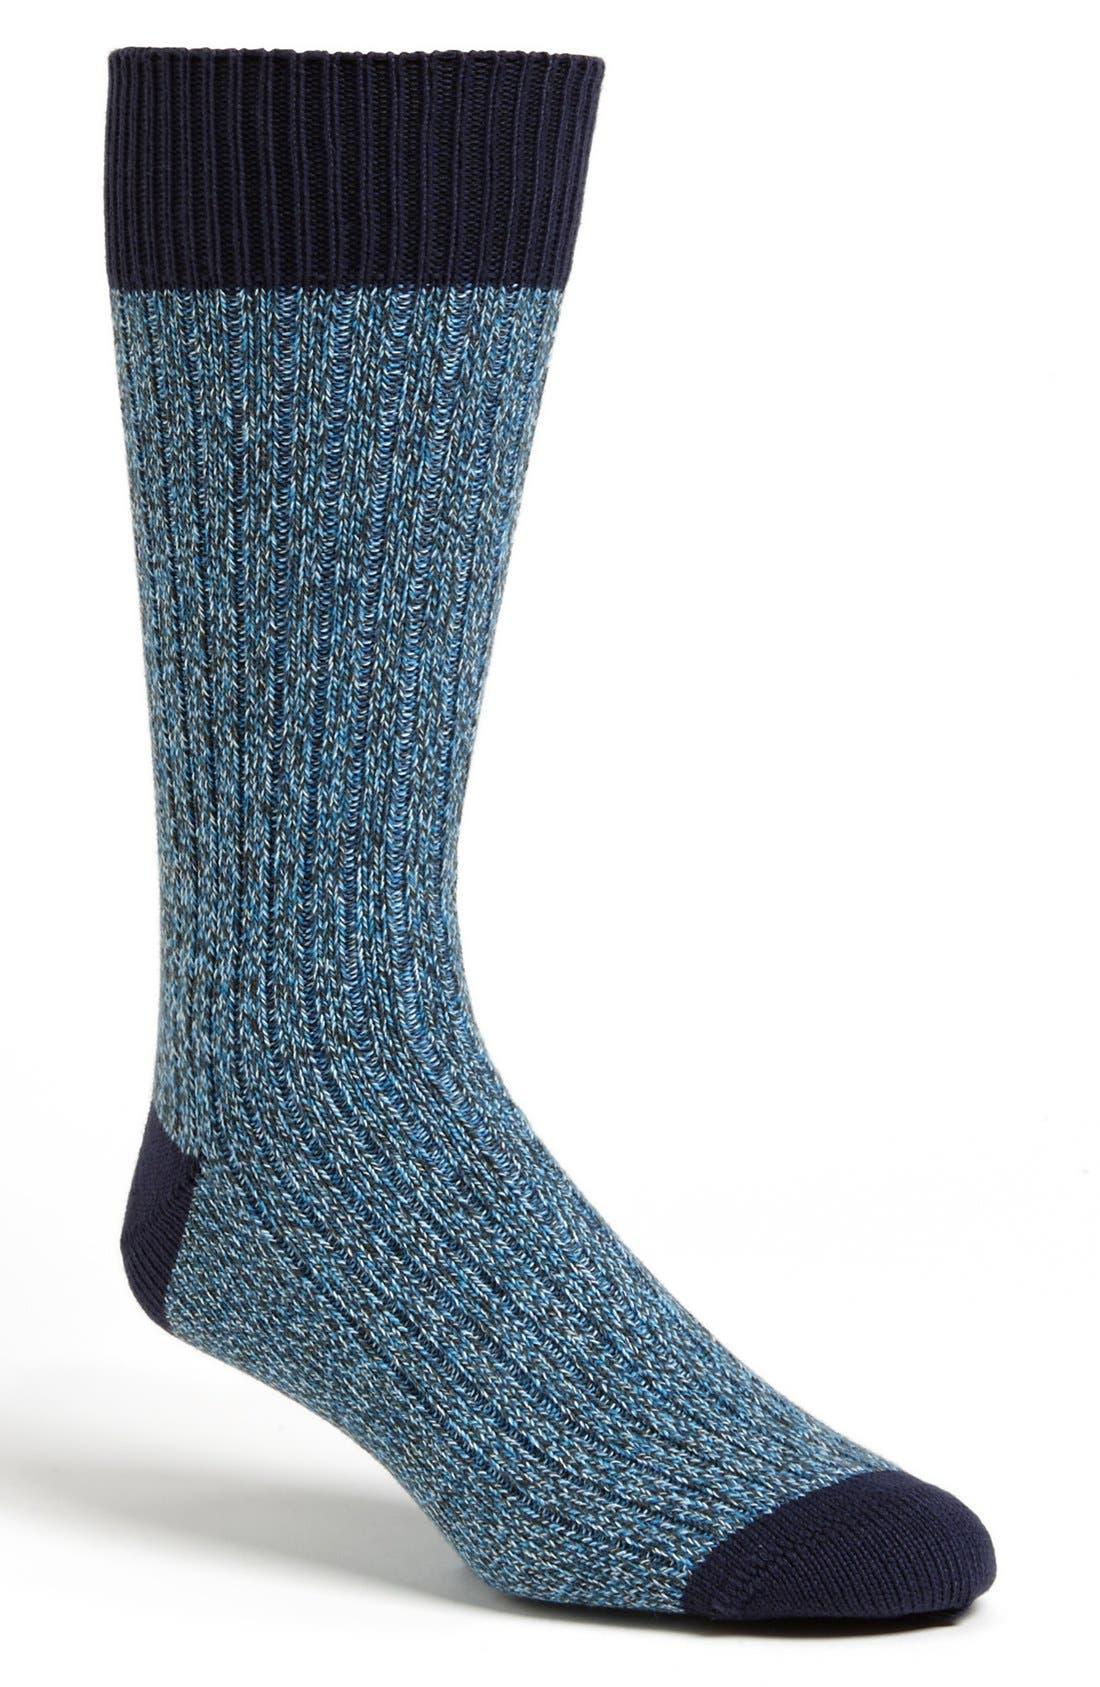 Alternate Image 1 Selected - Paul Smith Cotton Blend Socks